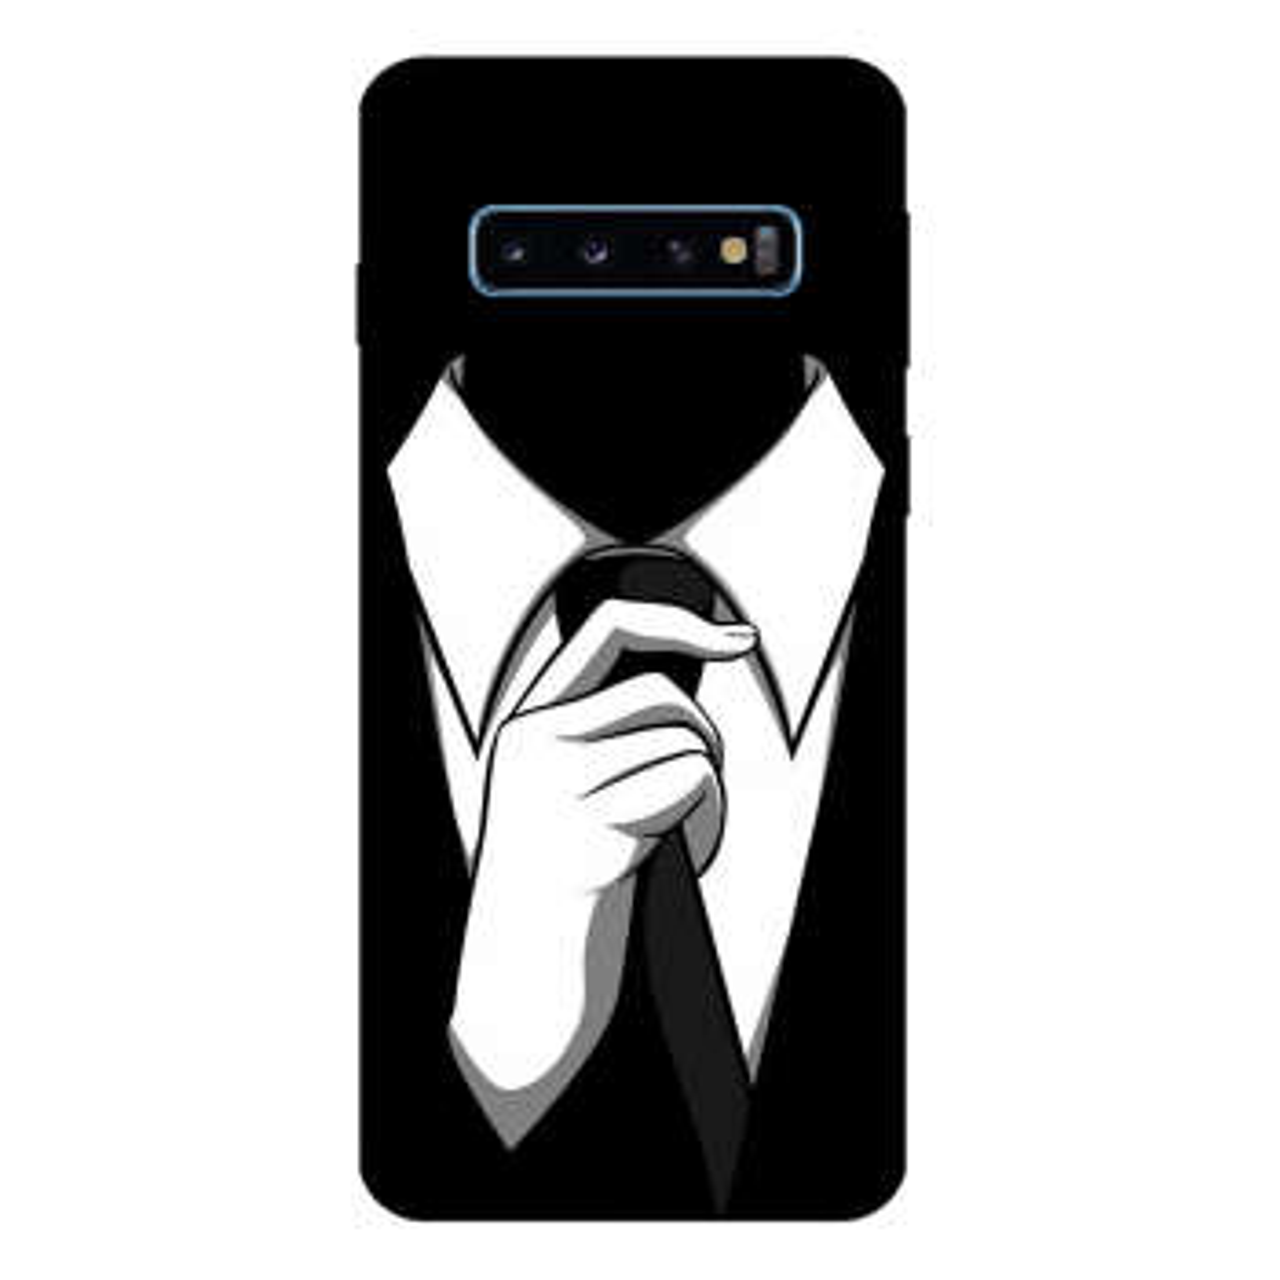 کاور کی اچ کد 7131 مناسب برای گوشی موبایل سامسونگ  Galaxy S10 PLUS